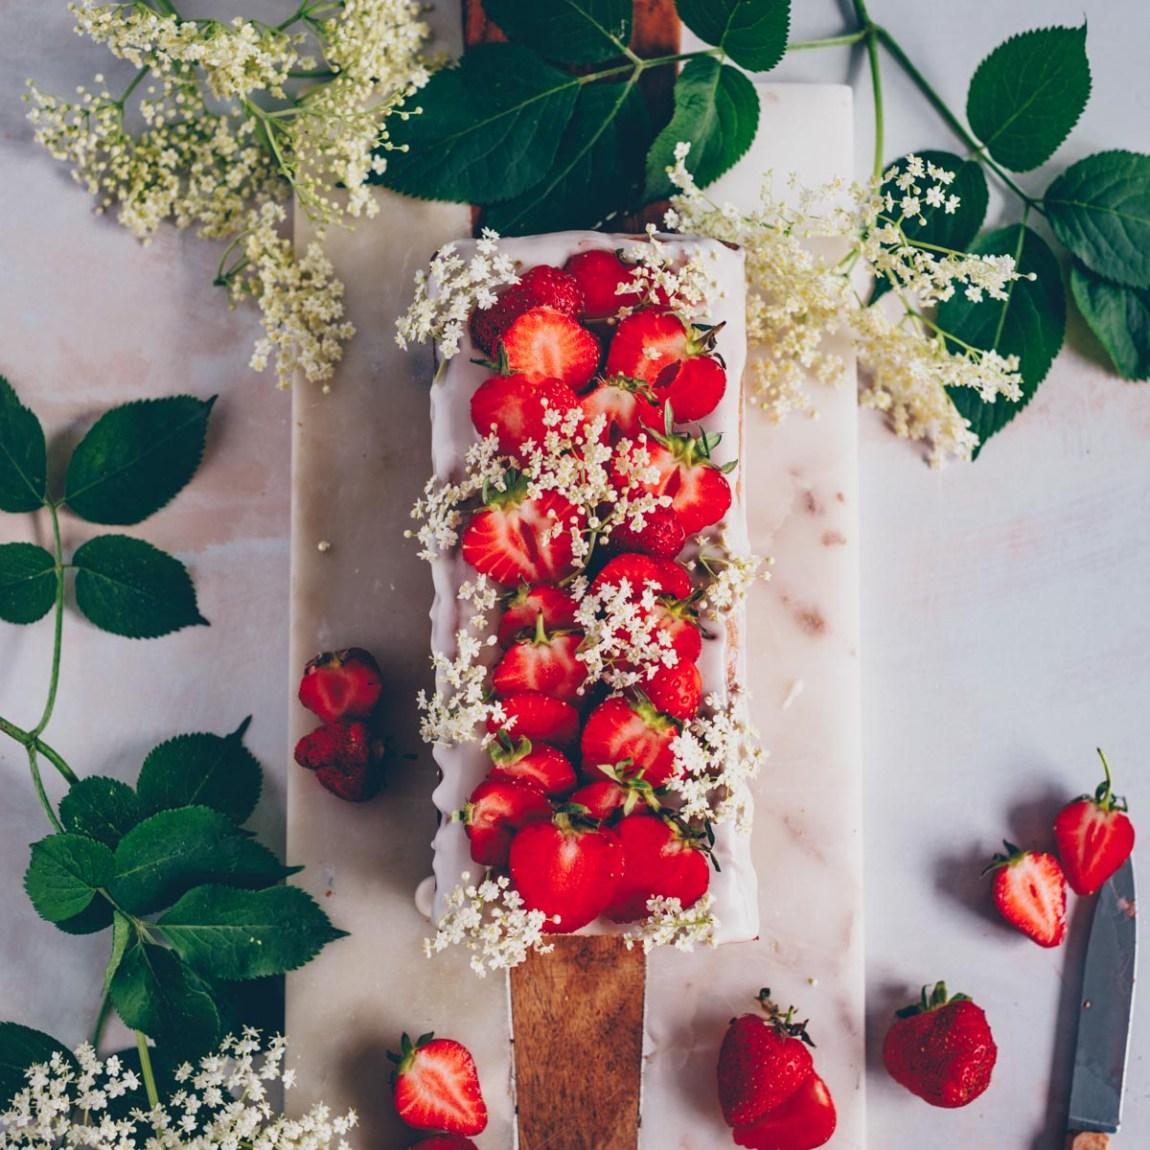 Zitronenkuchen mit Holunderblüten